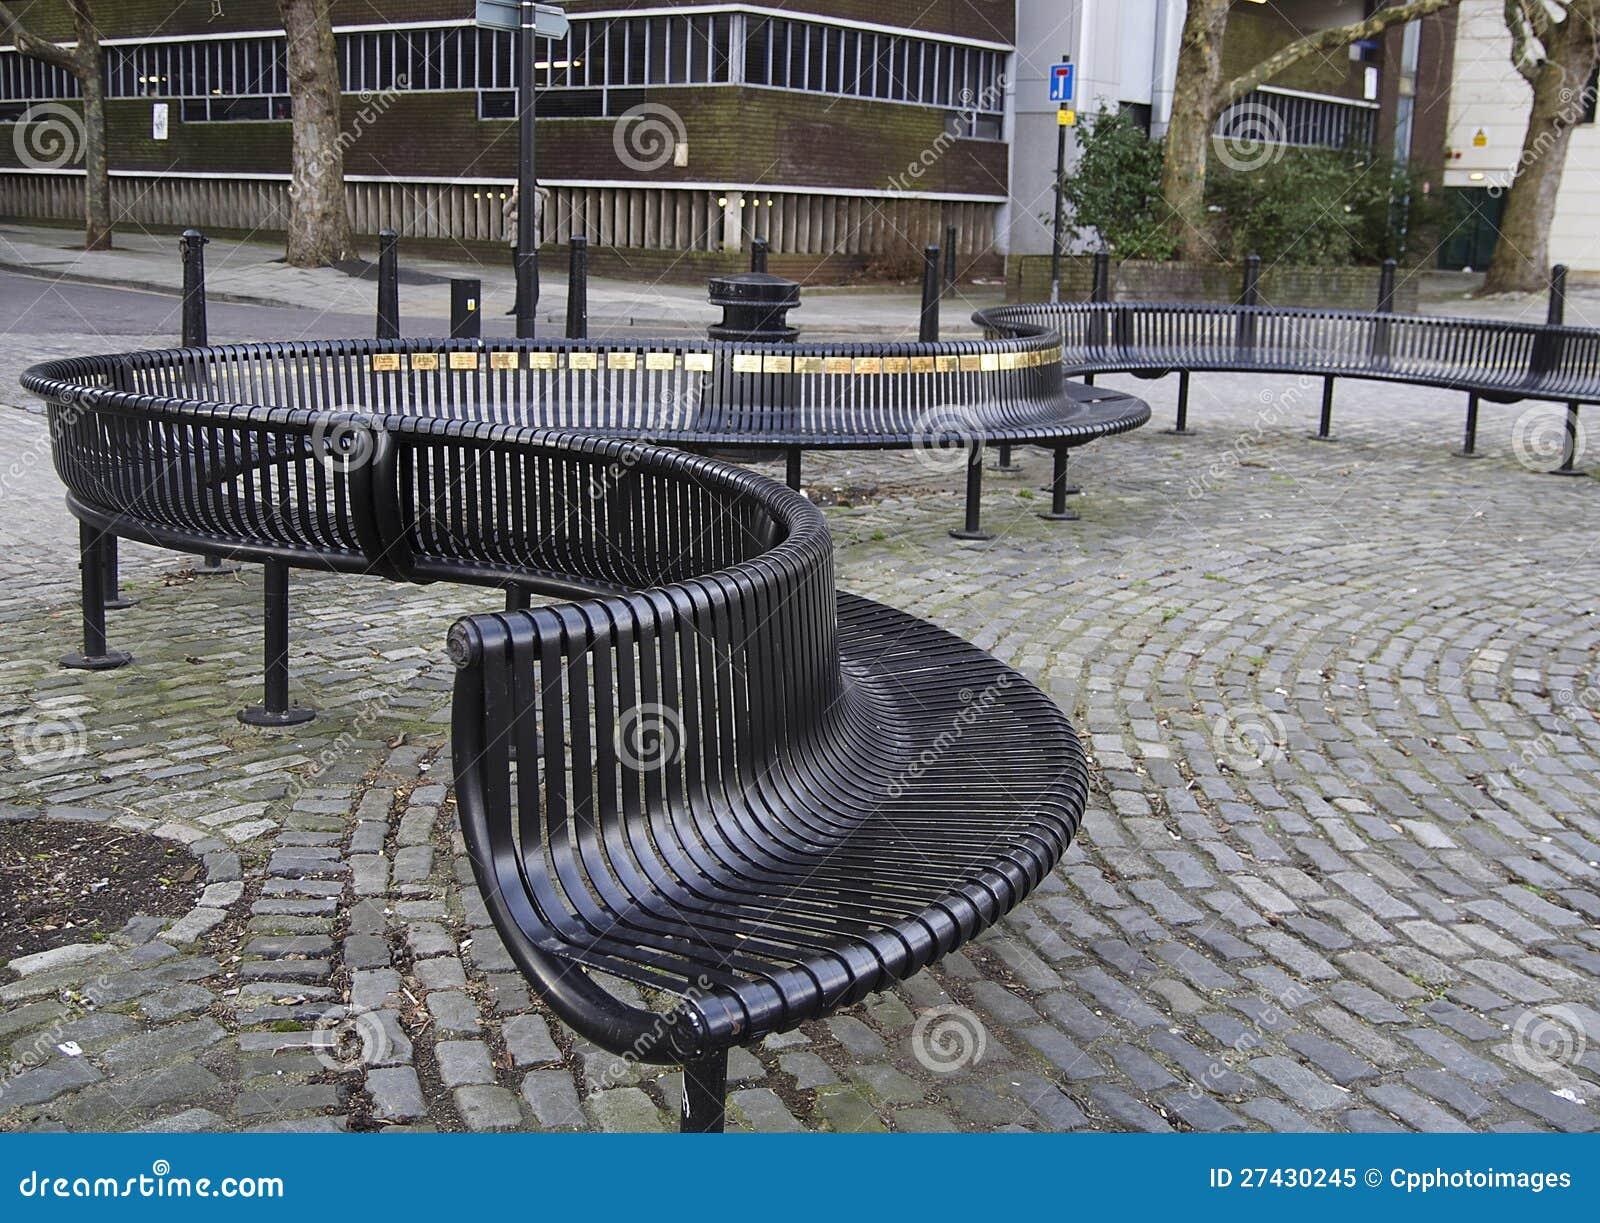 ... Metal Outdoor Seating Royalty Free Stock Photo - Image: 27430245